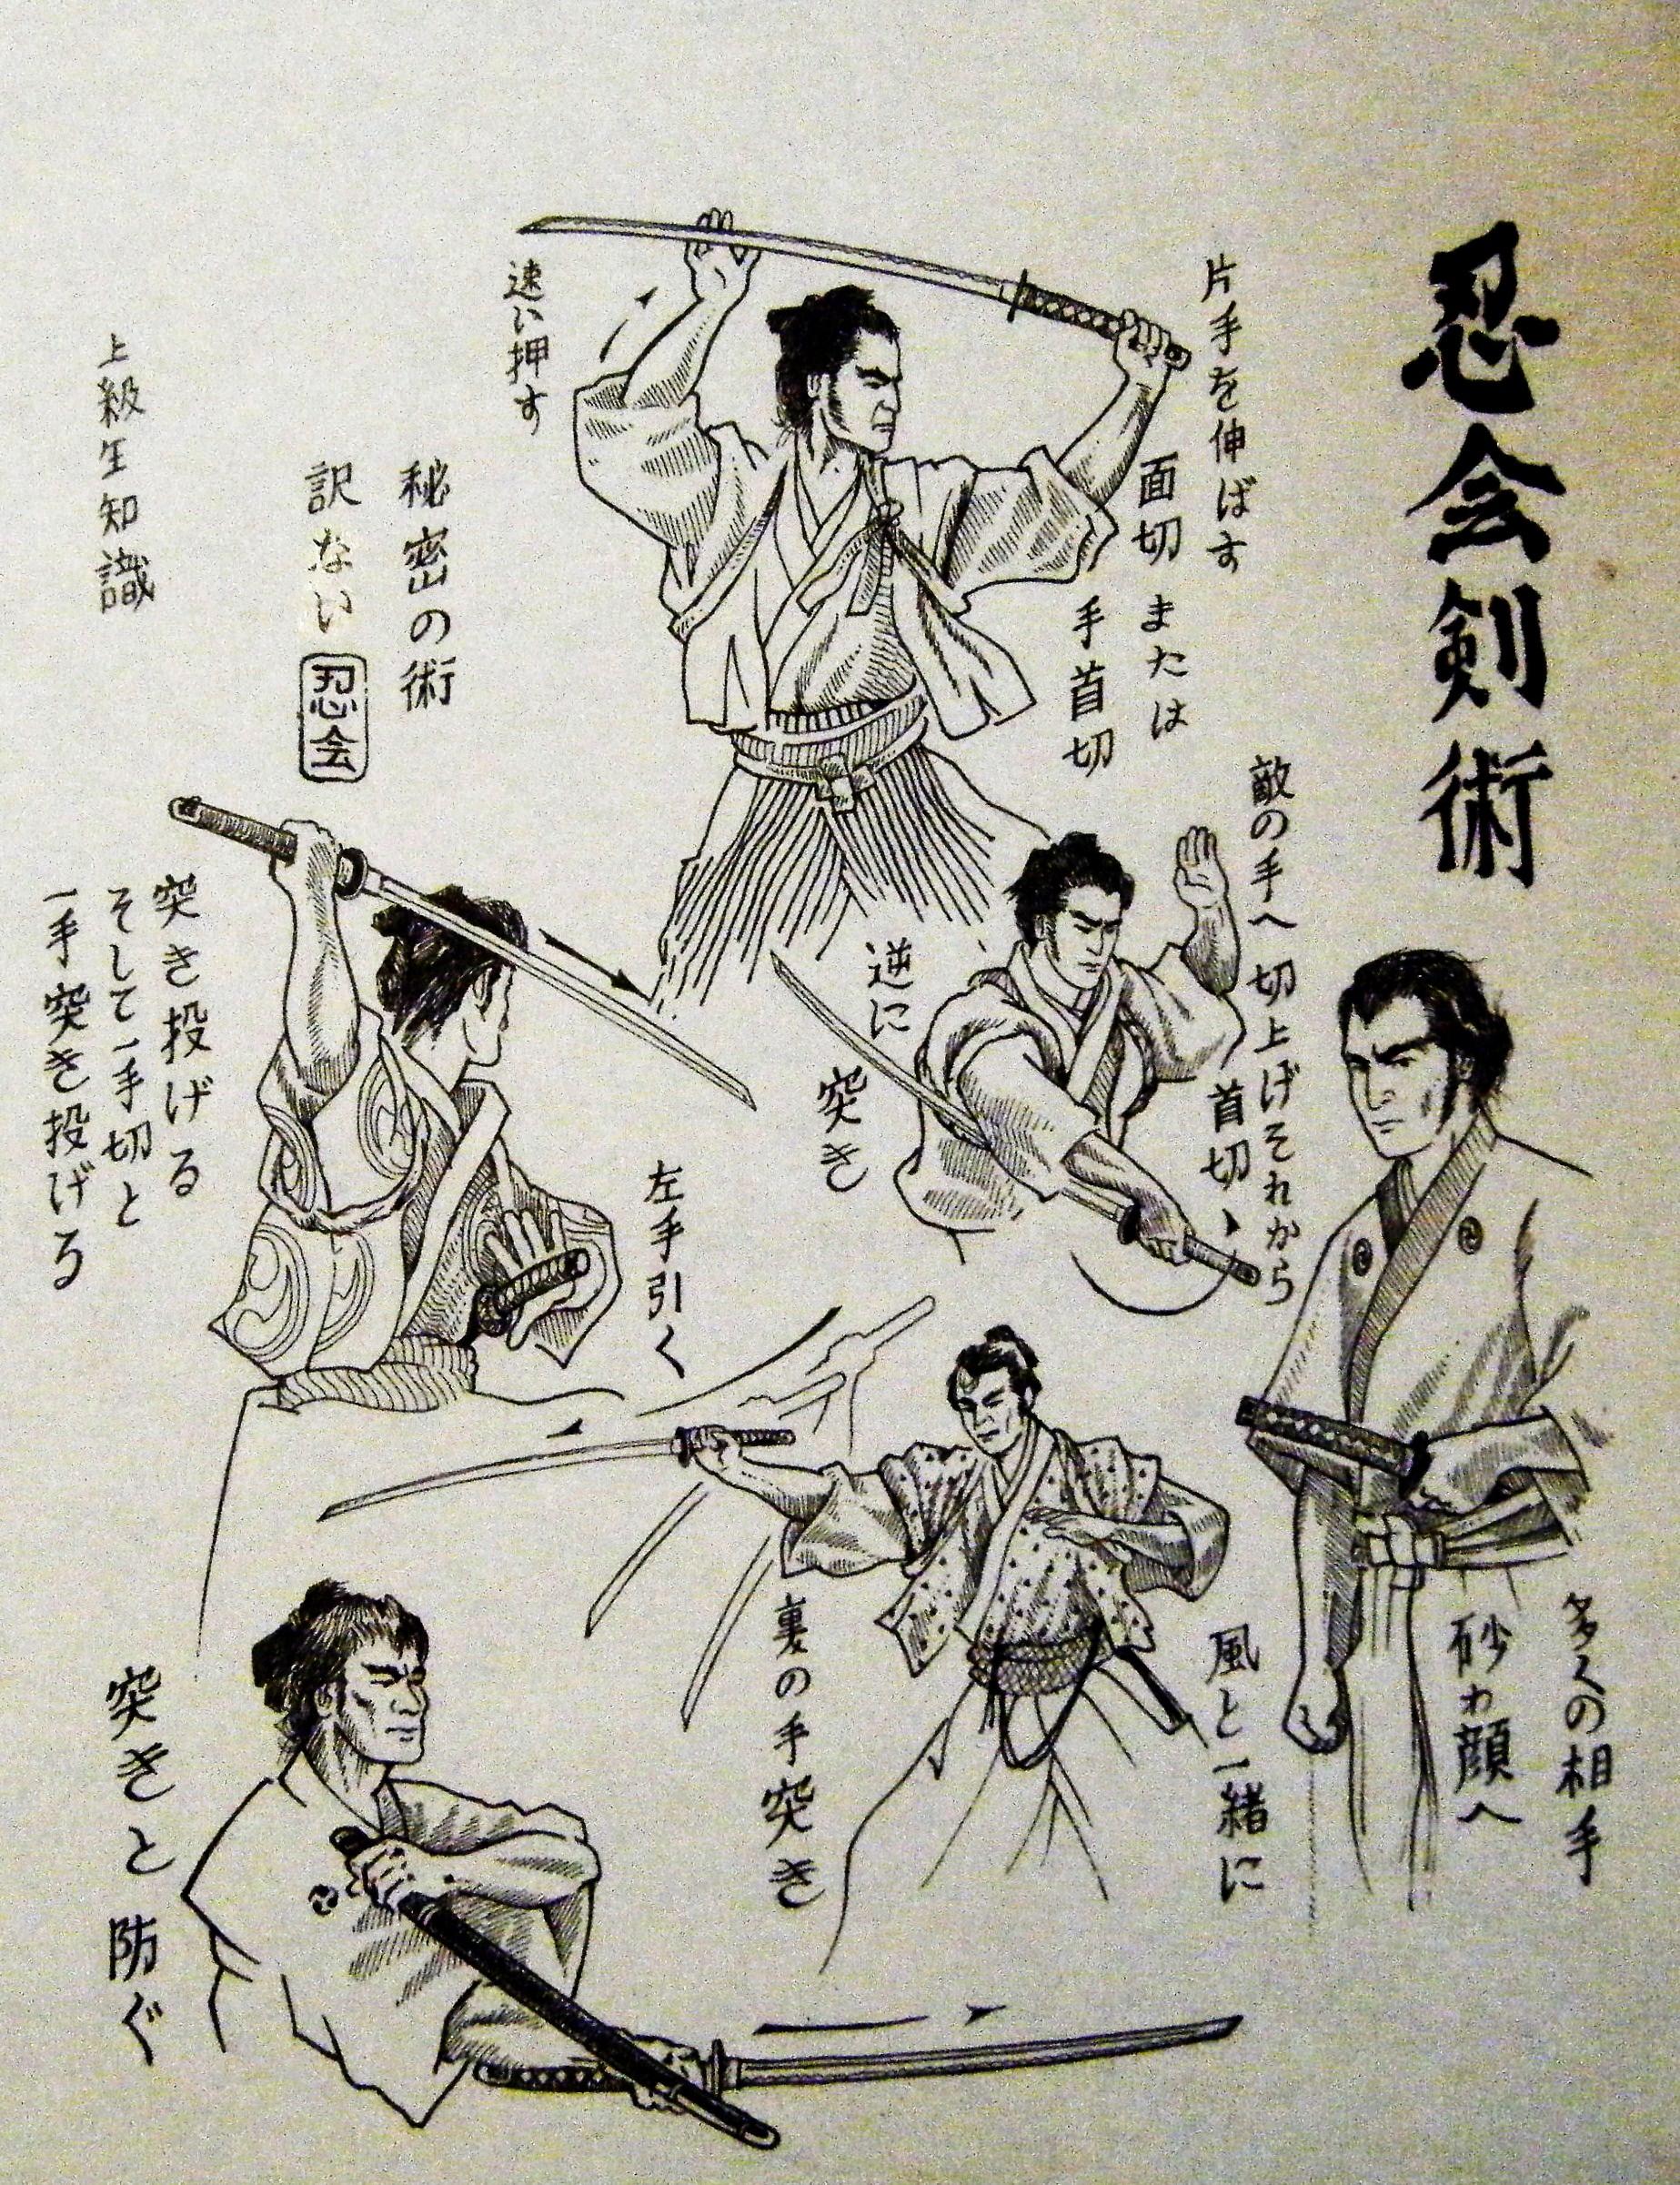 Tsurugi Sword - Samurai Swords Store